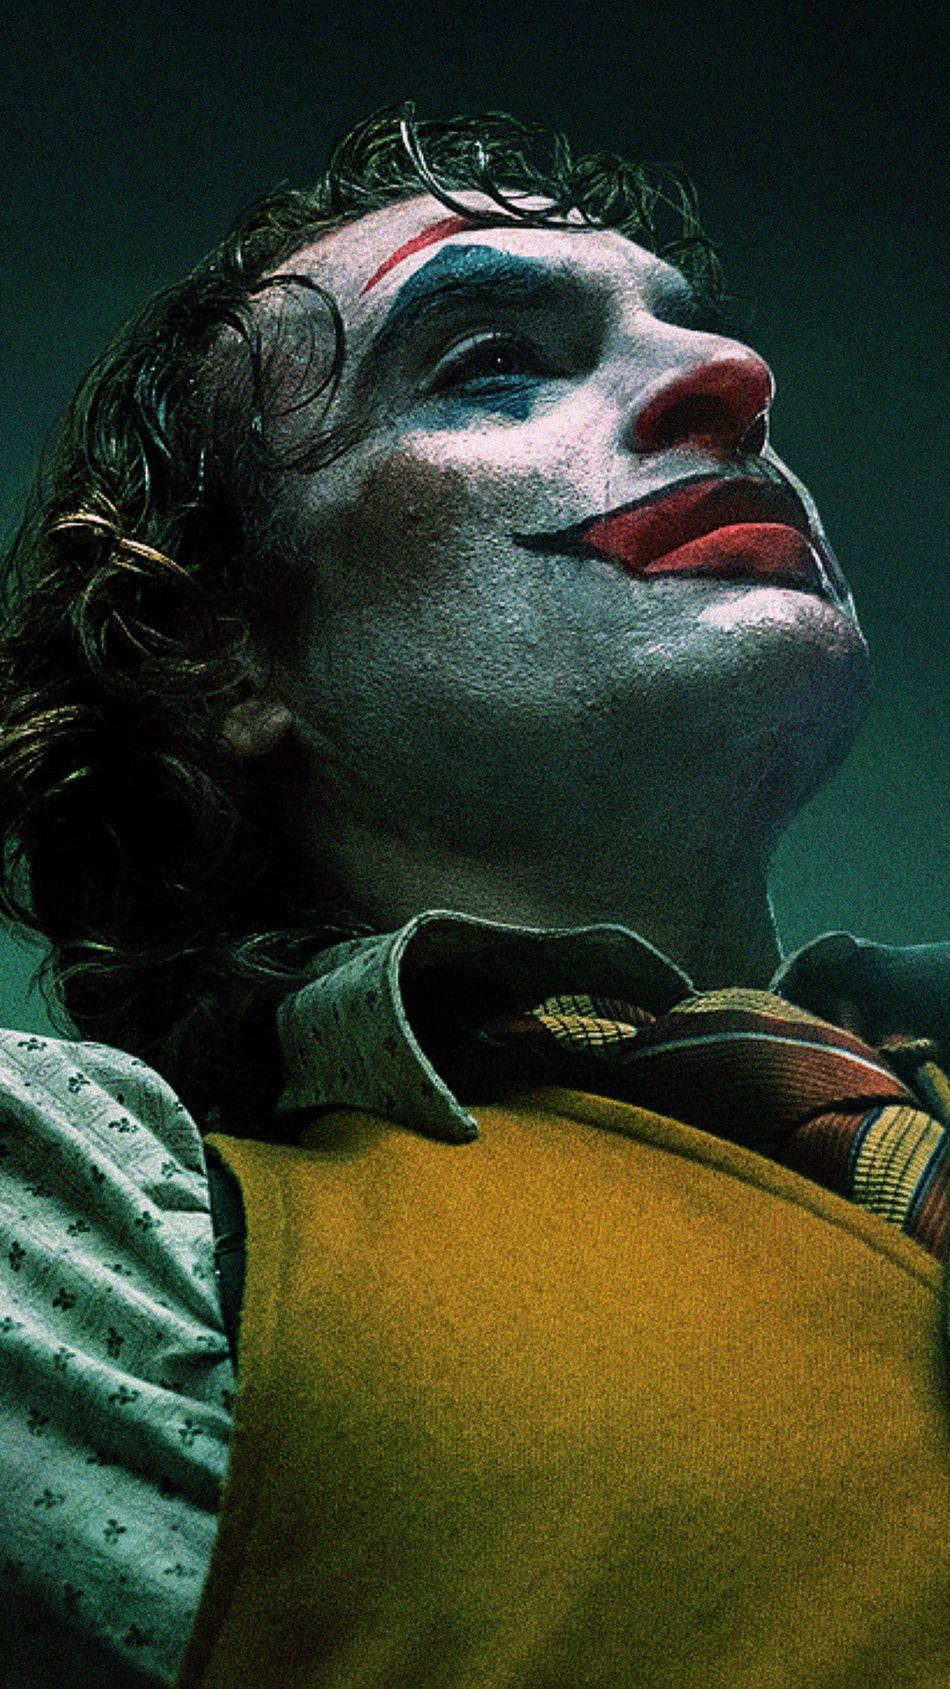 Sfondi Joker 2019 4k | SfondiWe